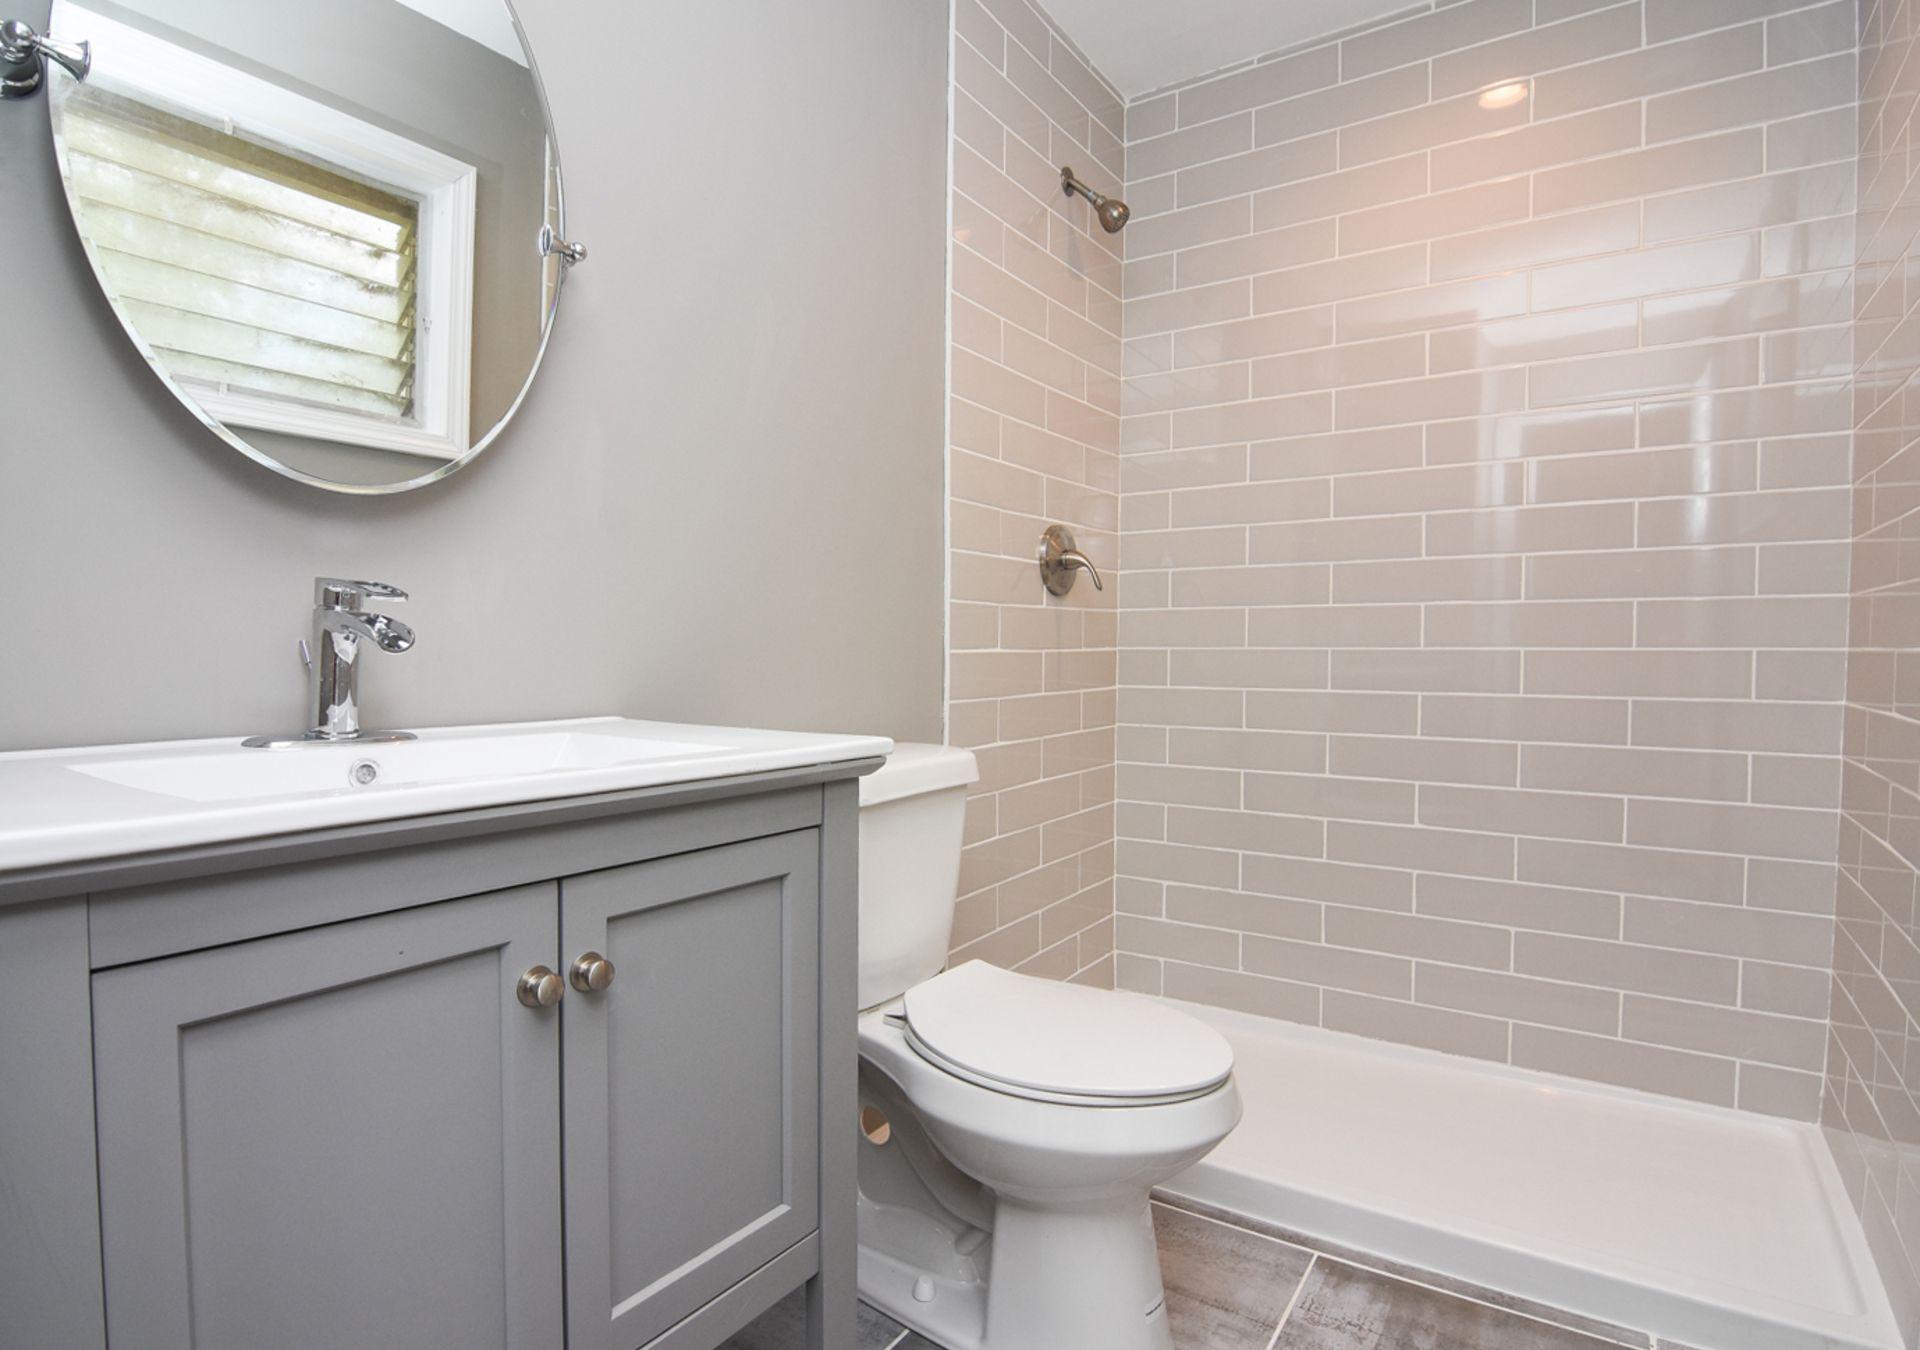 When a Bathroom Remodel Isn't an Improvement